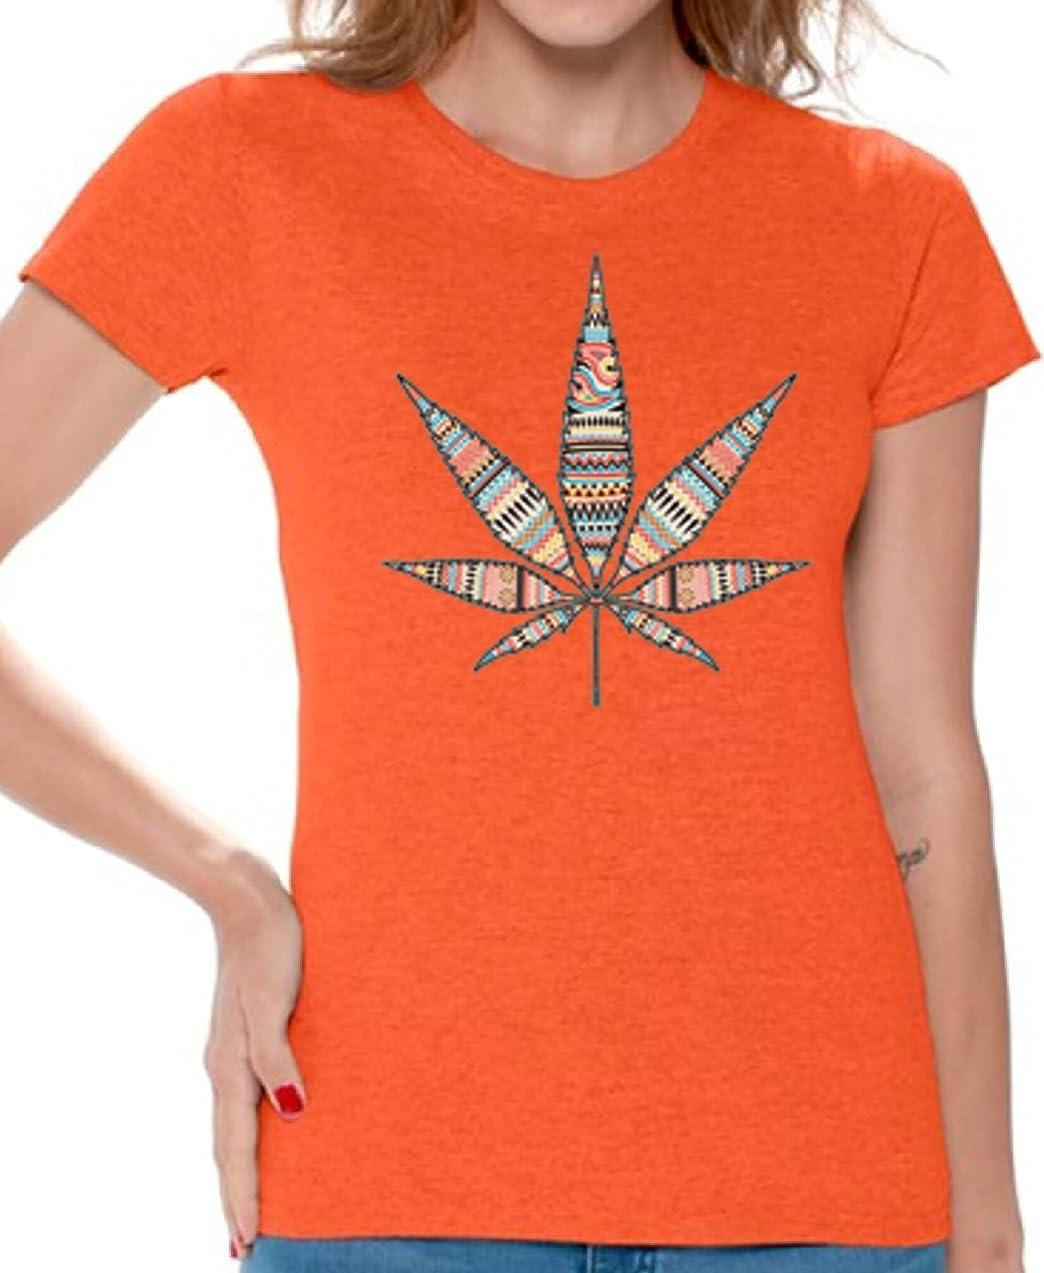 Awkward Styles Women's Marijuana Leaf Cute T Shirts Tee Tops for Women for Cannabis Lovers